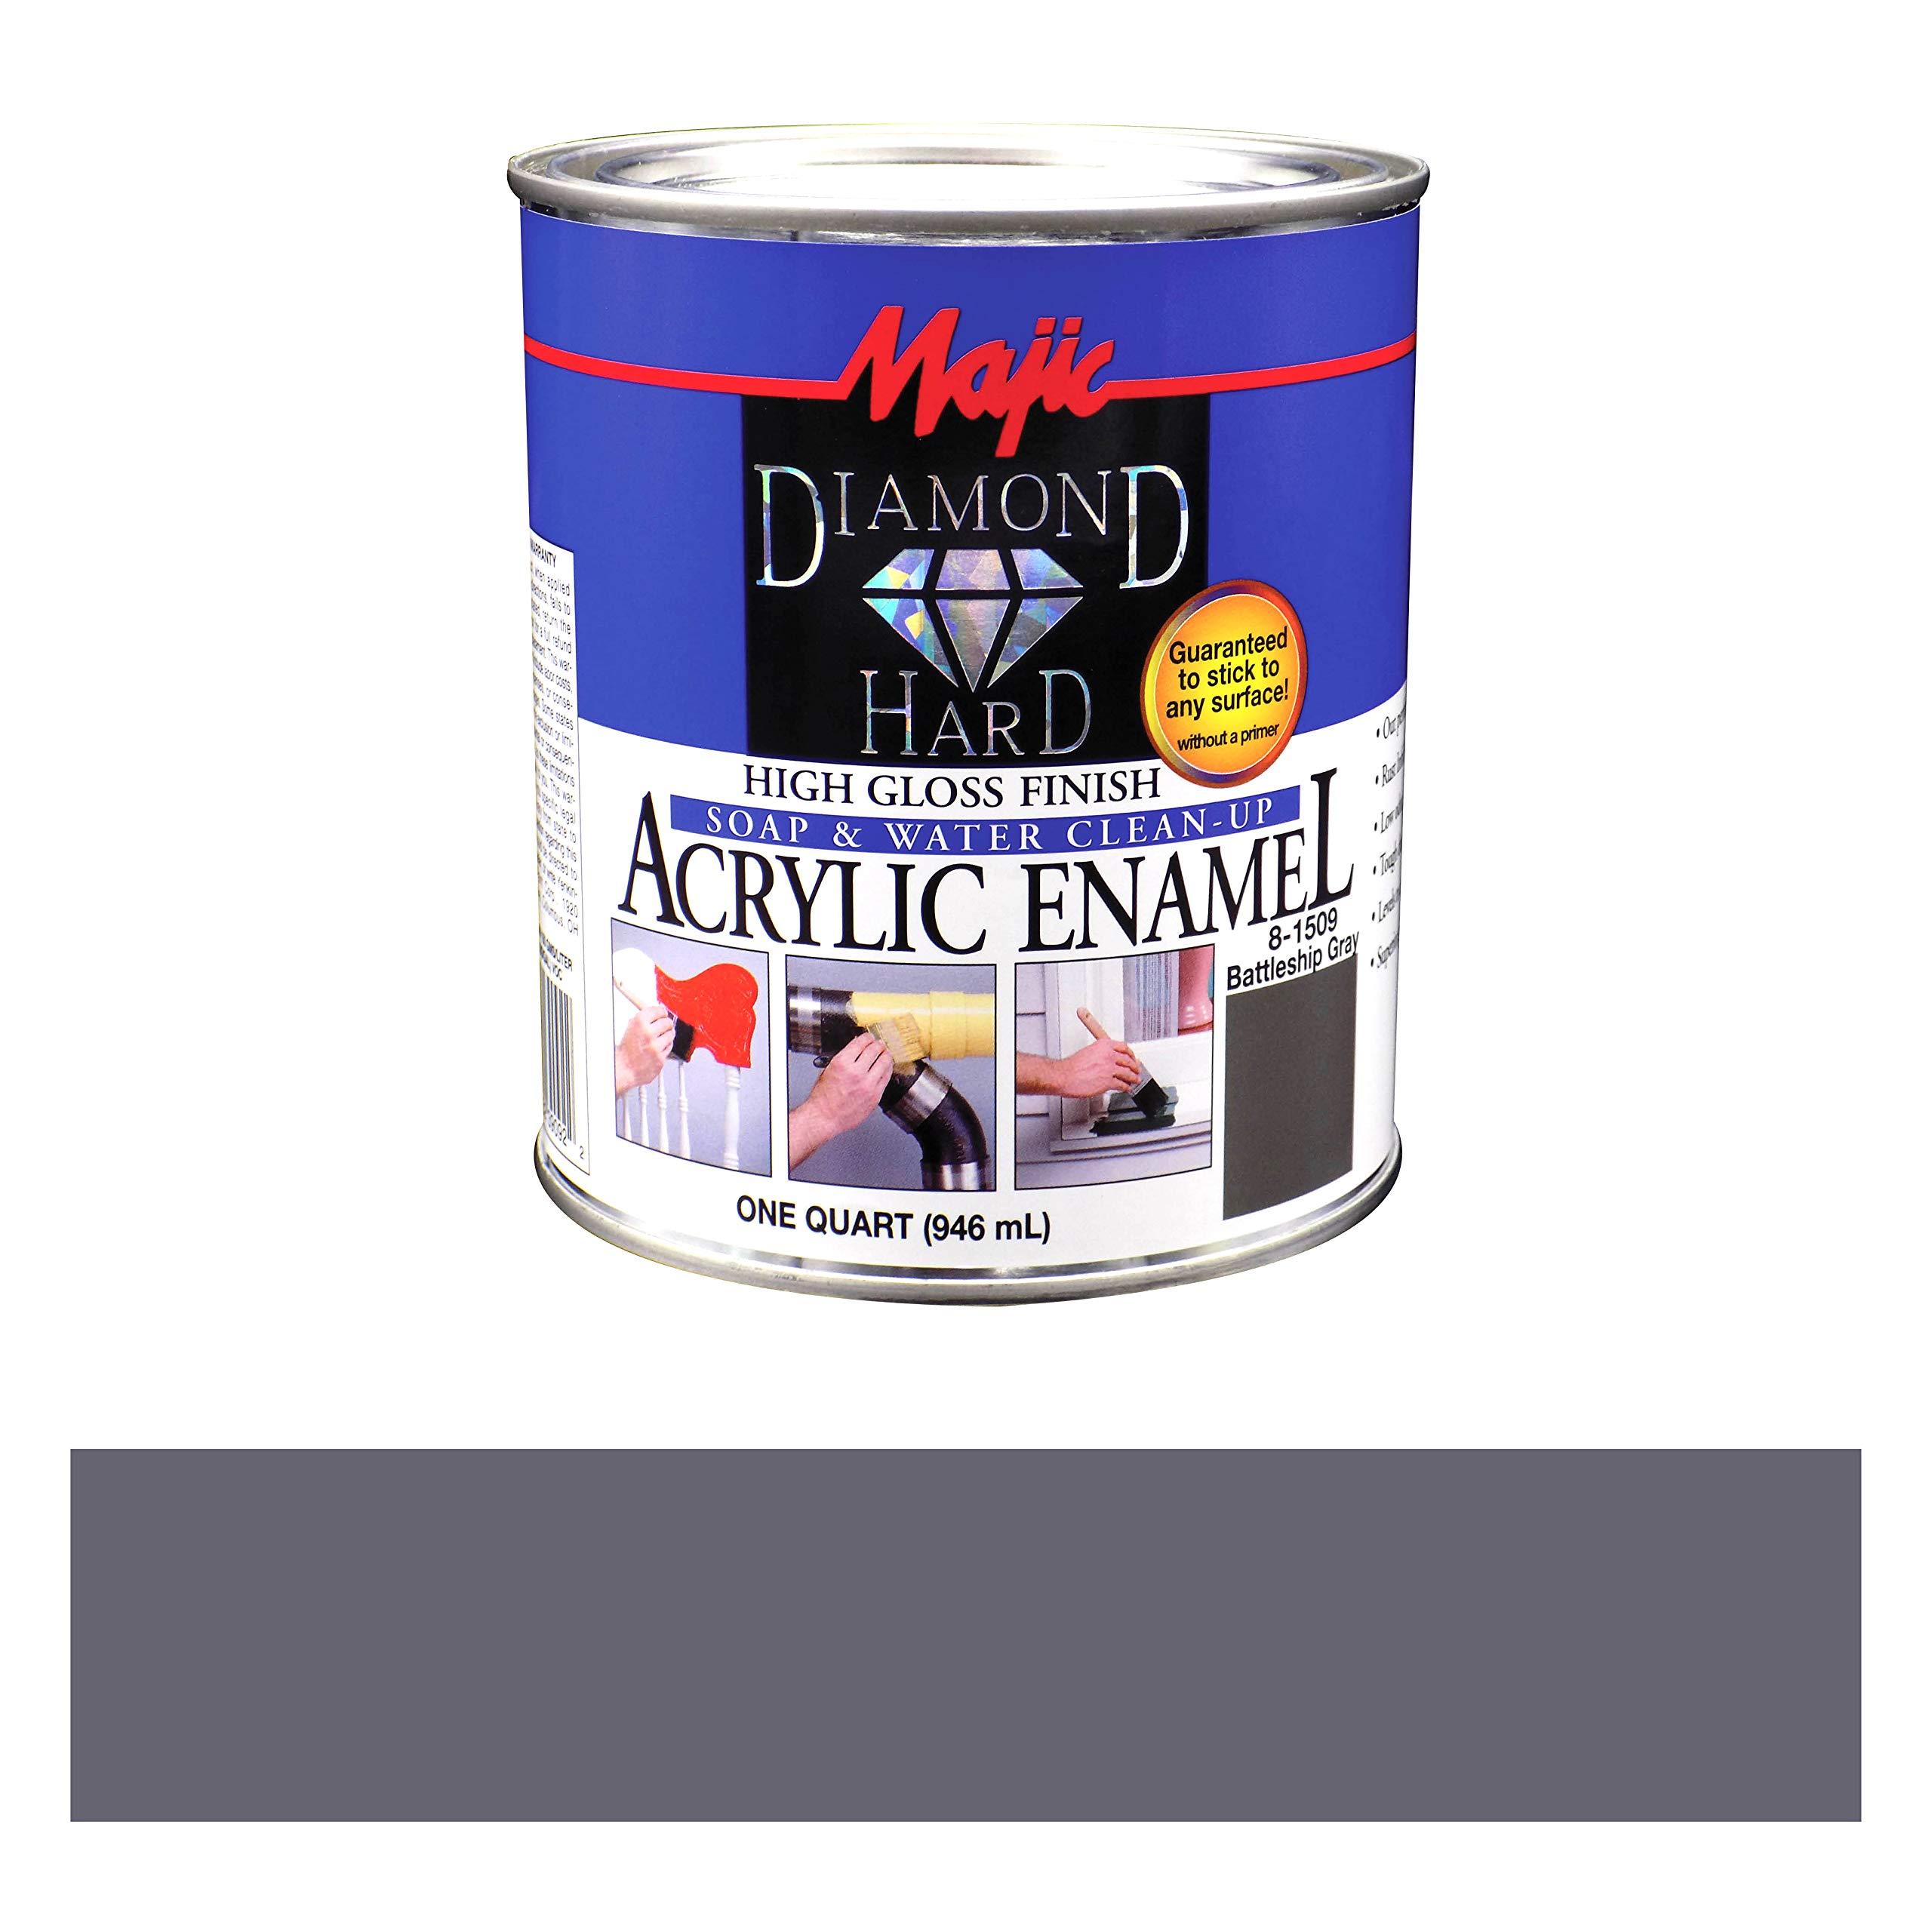 Majic Paints 8-1509-2 Diamond Hard Acrylic Enamel High Gloss Paint, 1- Quart, Battleship Gray